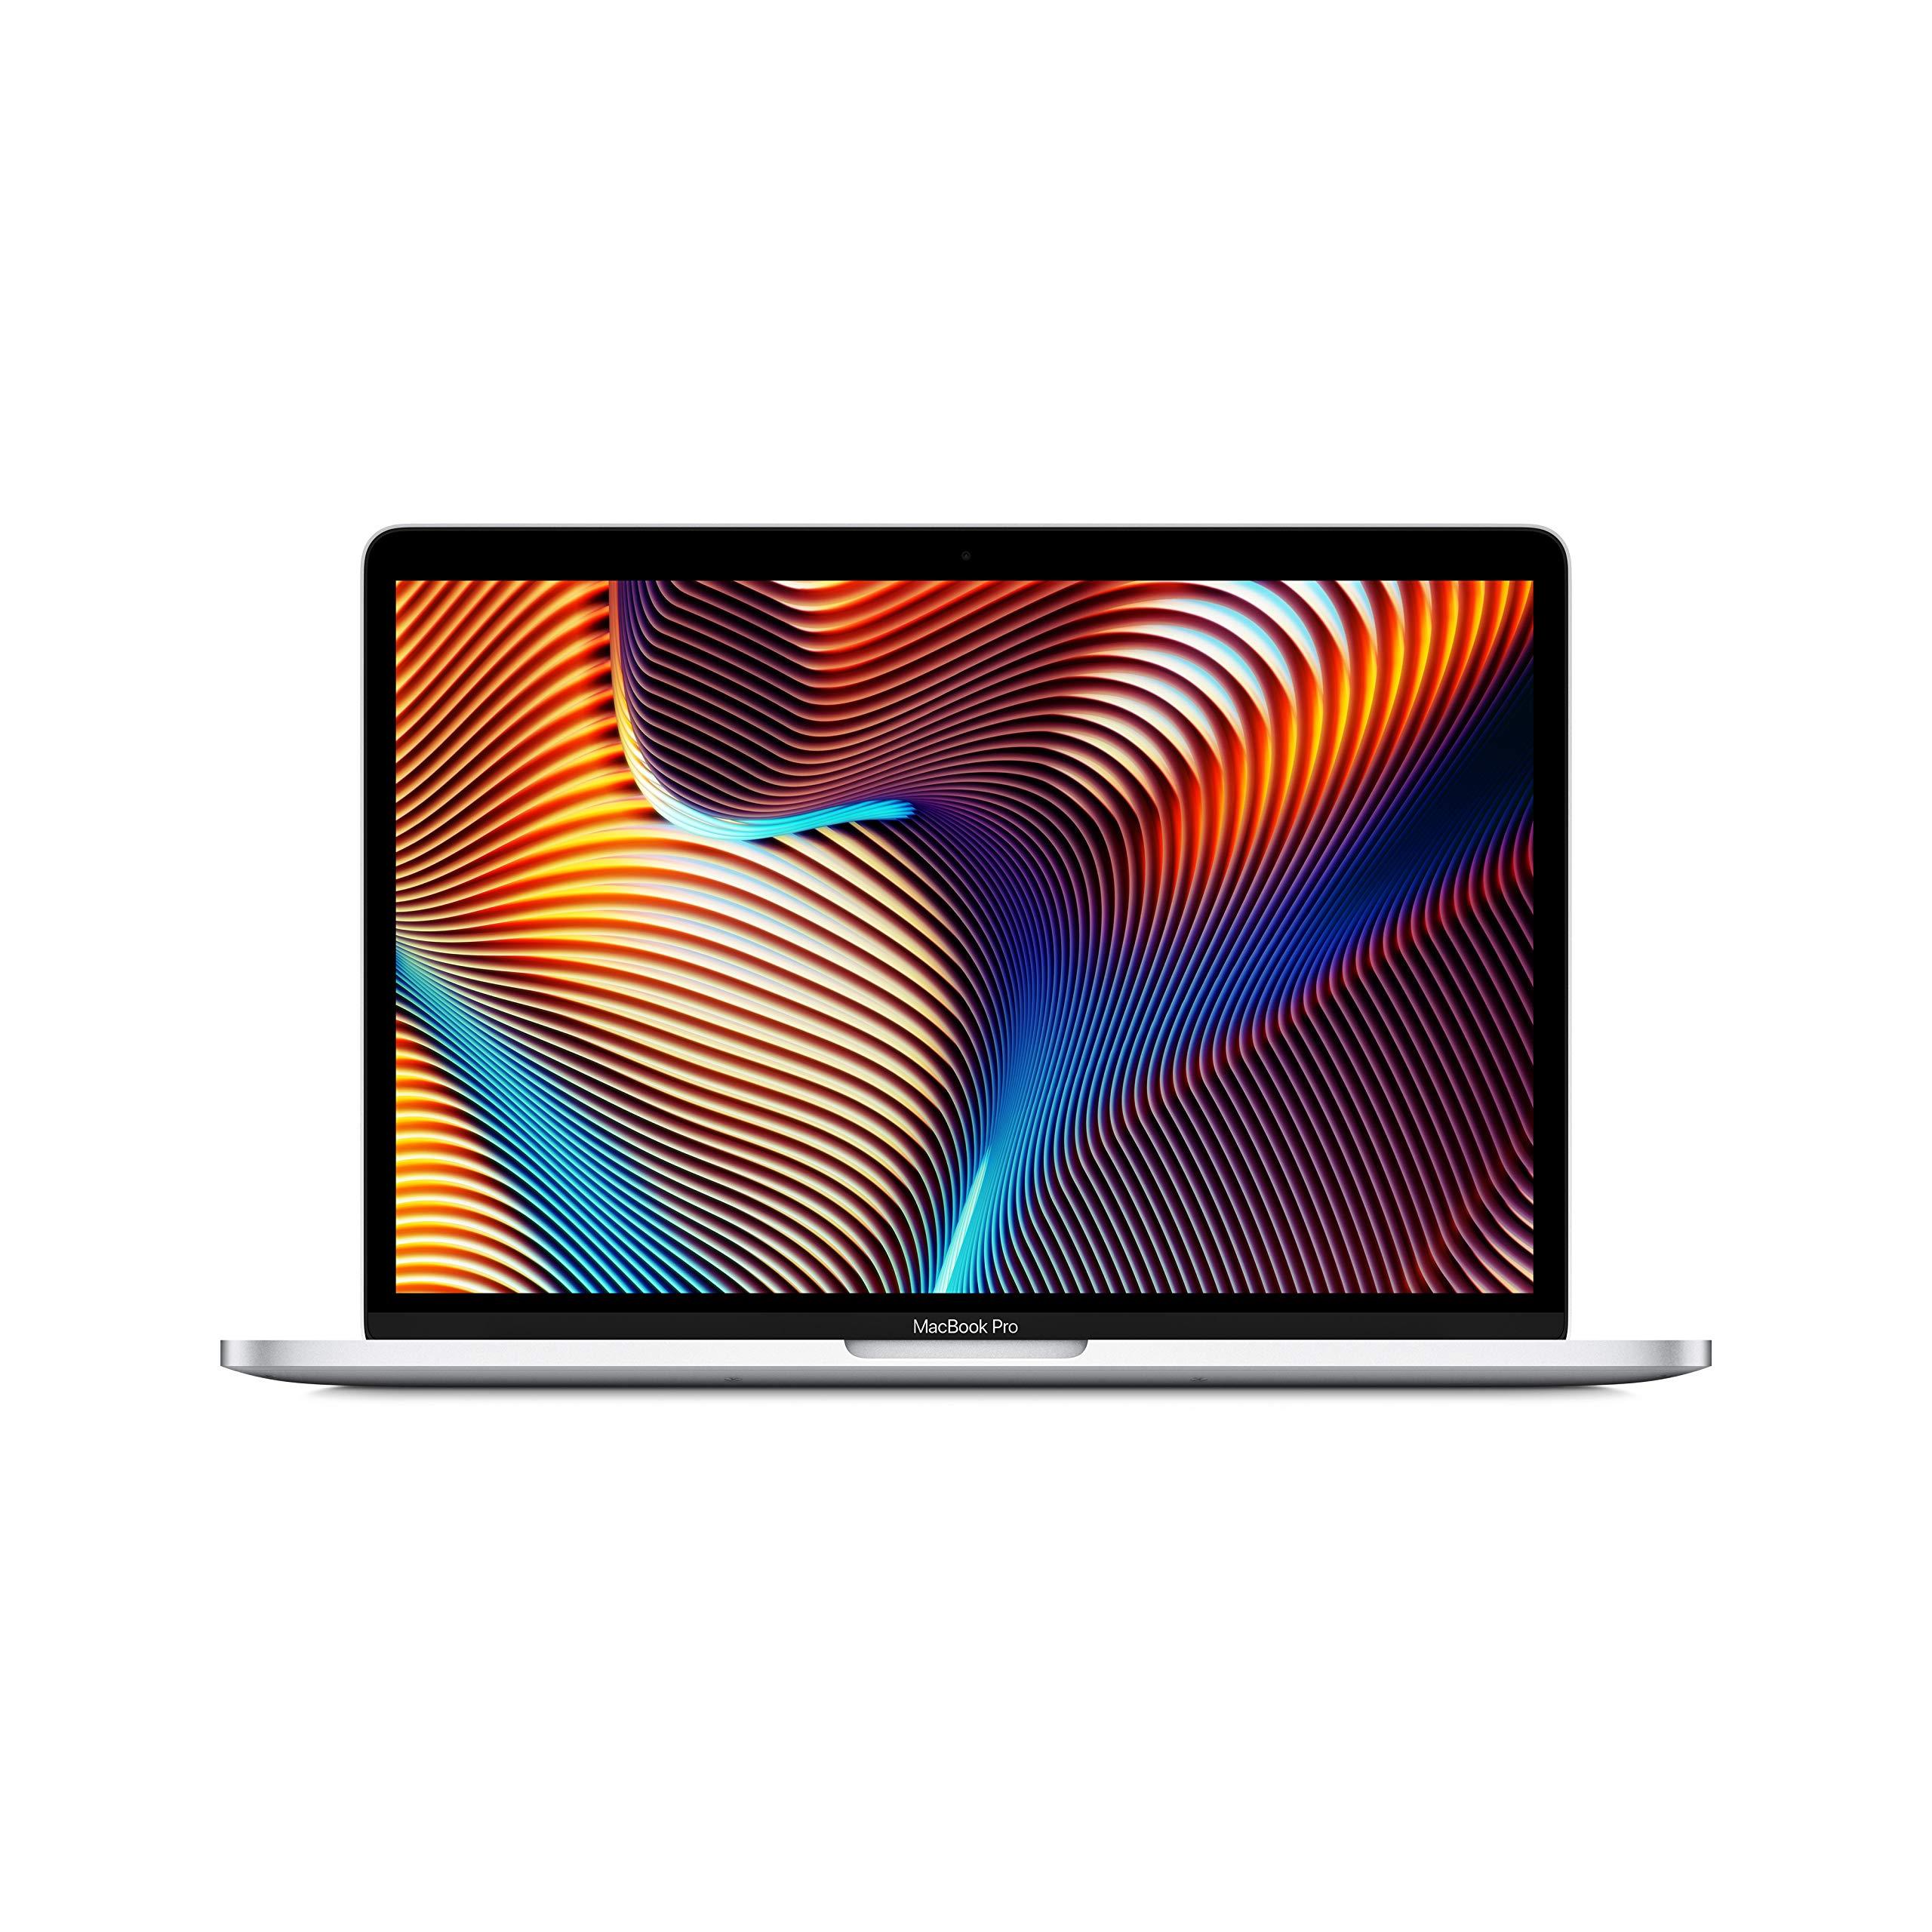 MacBook Pro MV992J/A